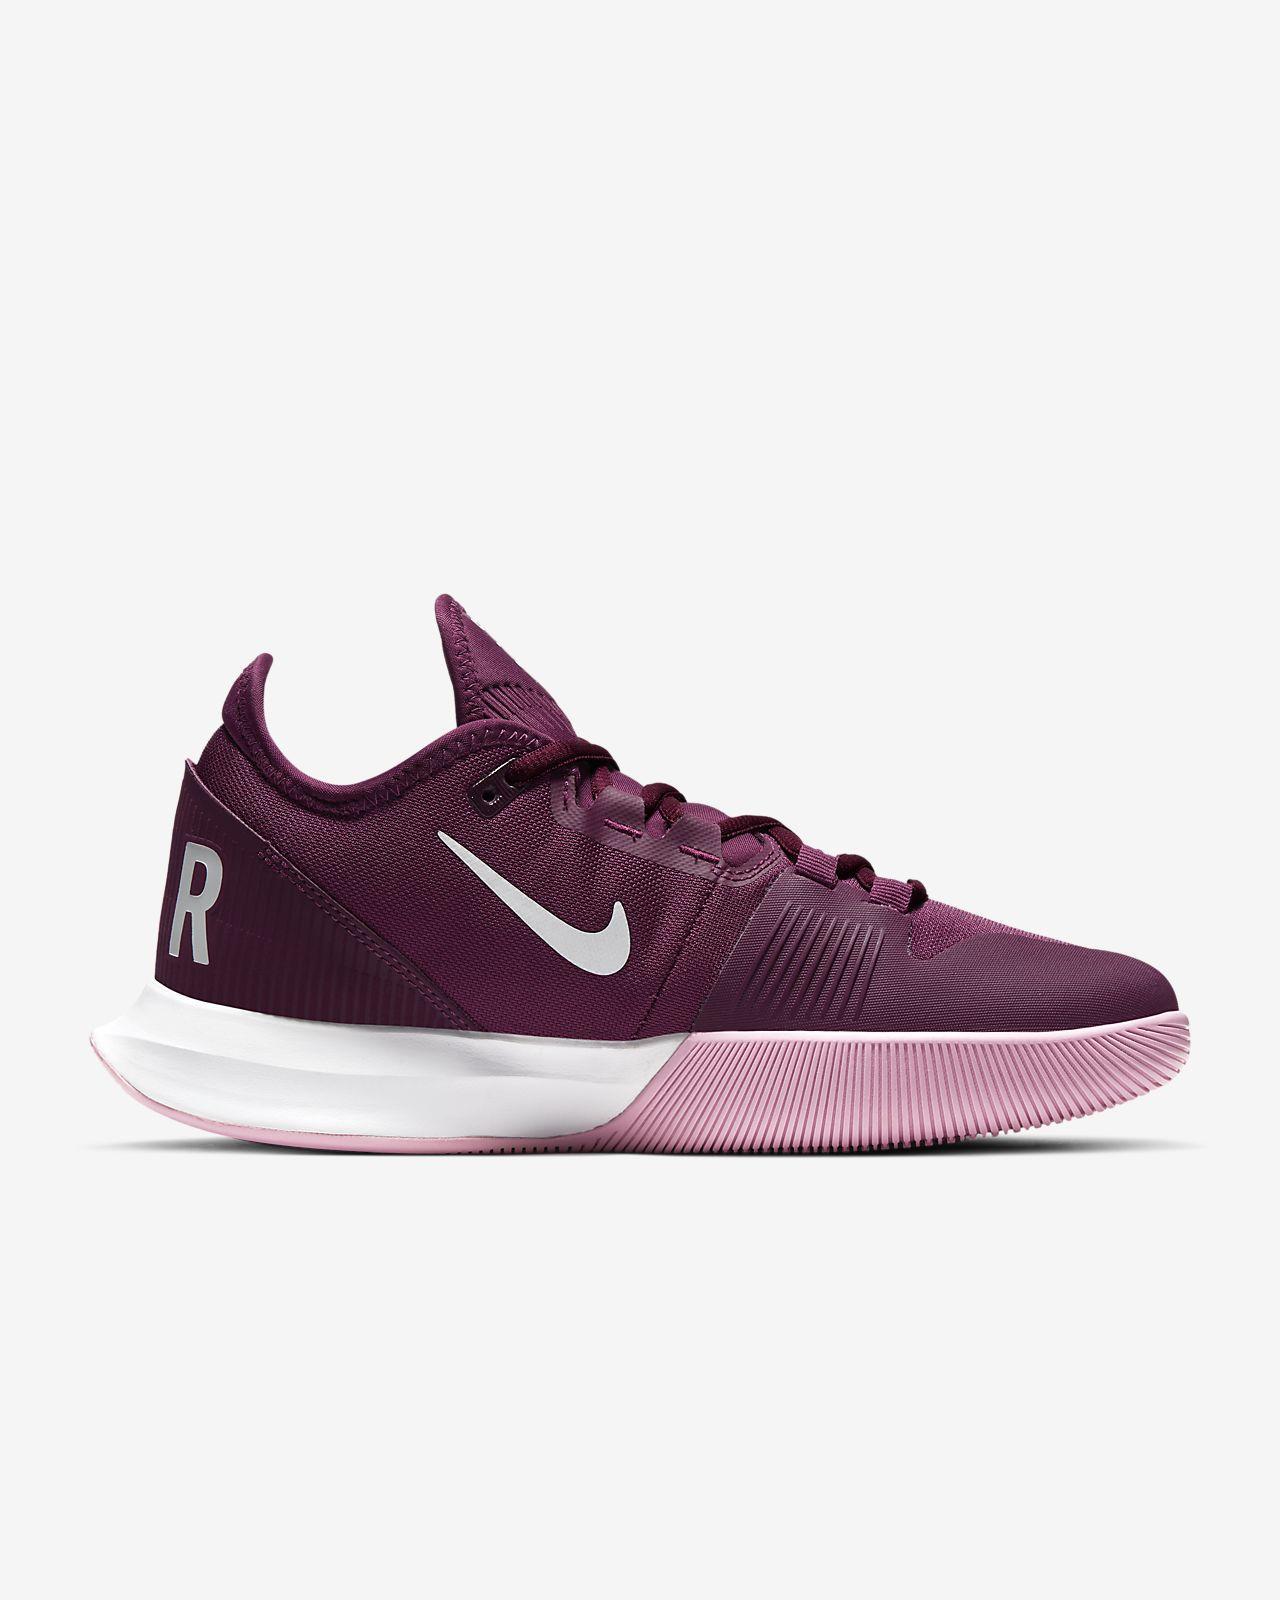 Chaussure de tennis NikeCourt Air Max Wildcard pour Femme